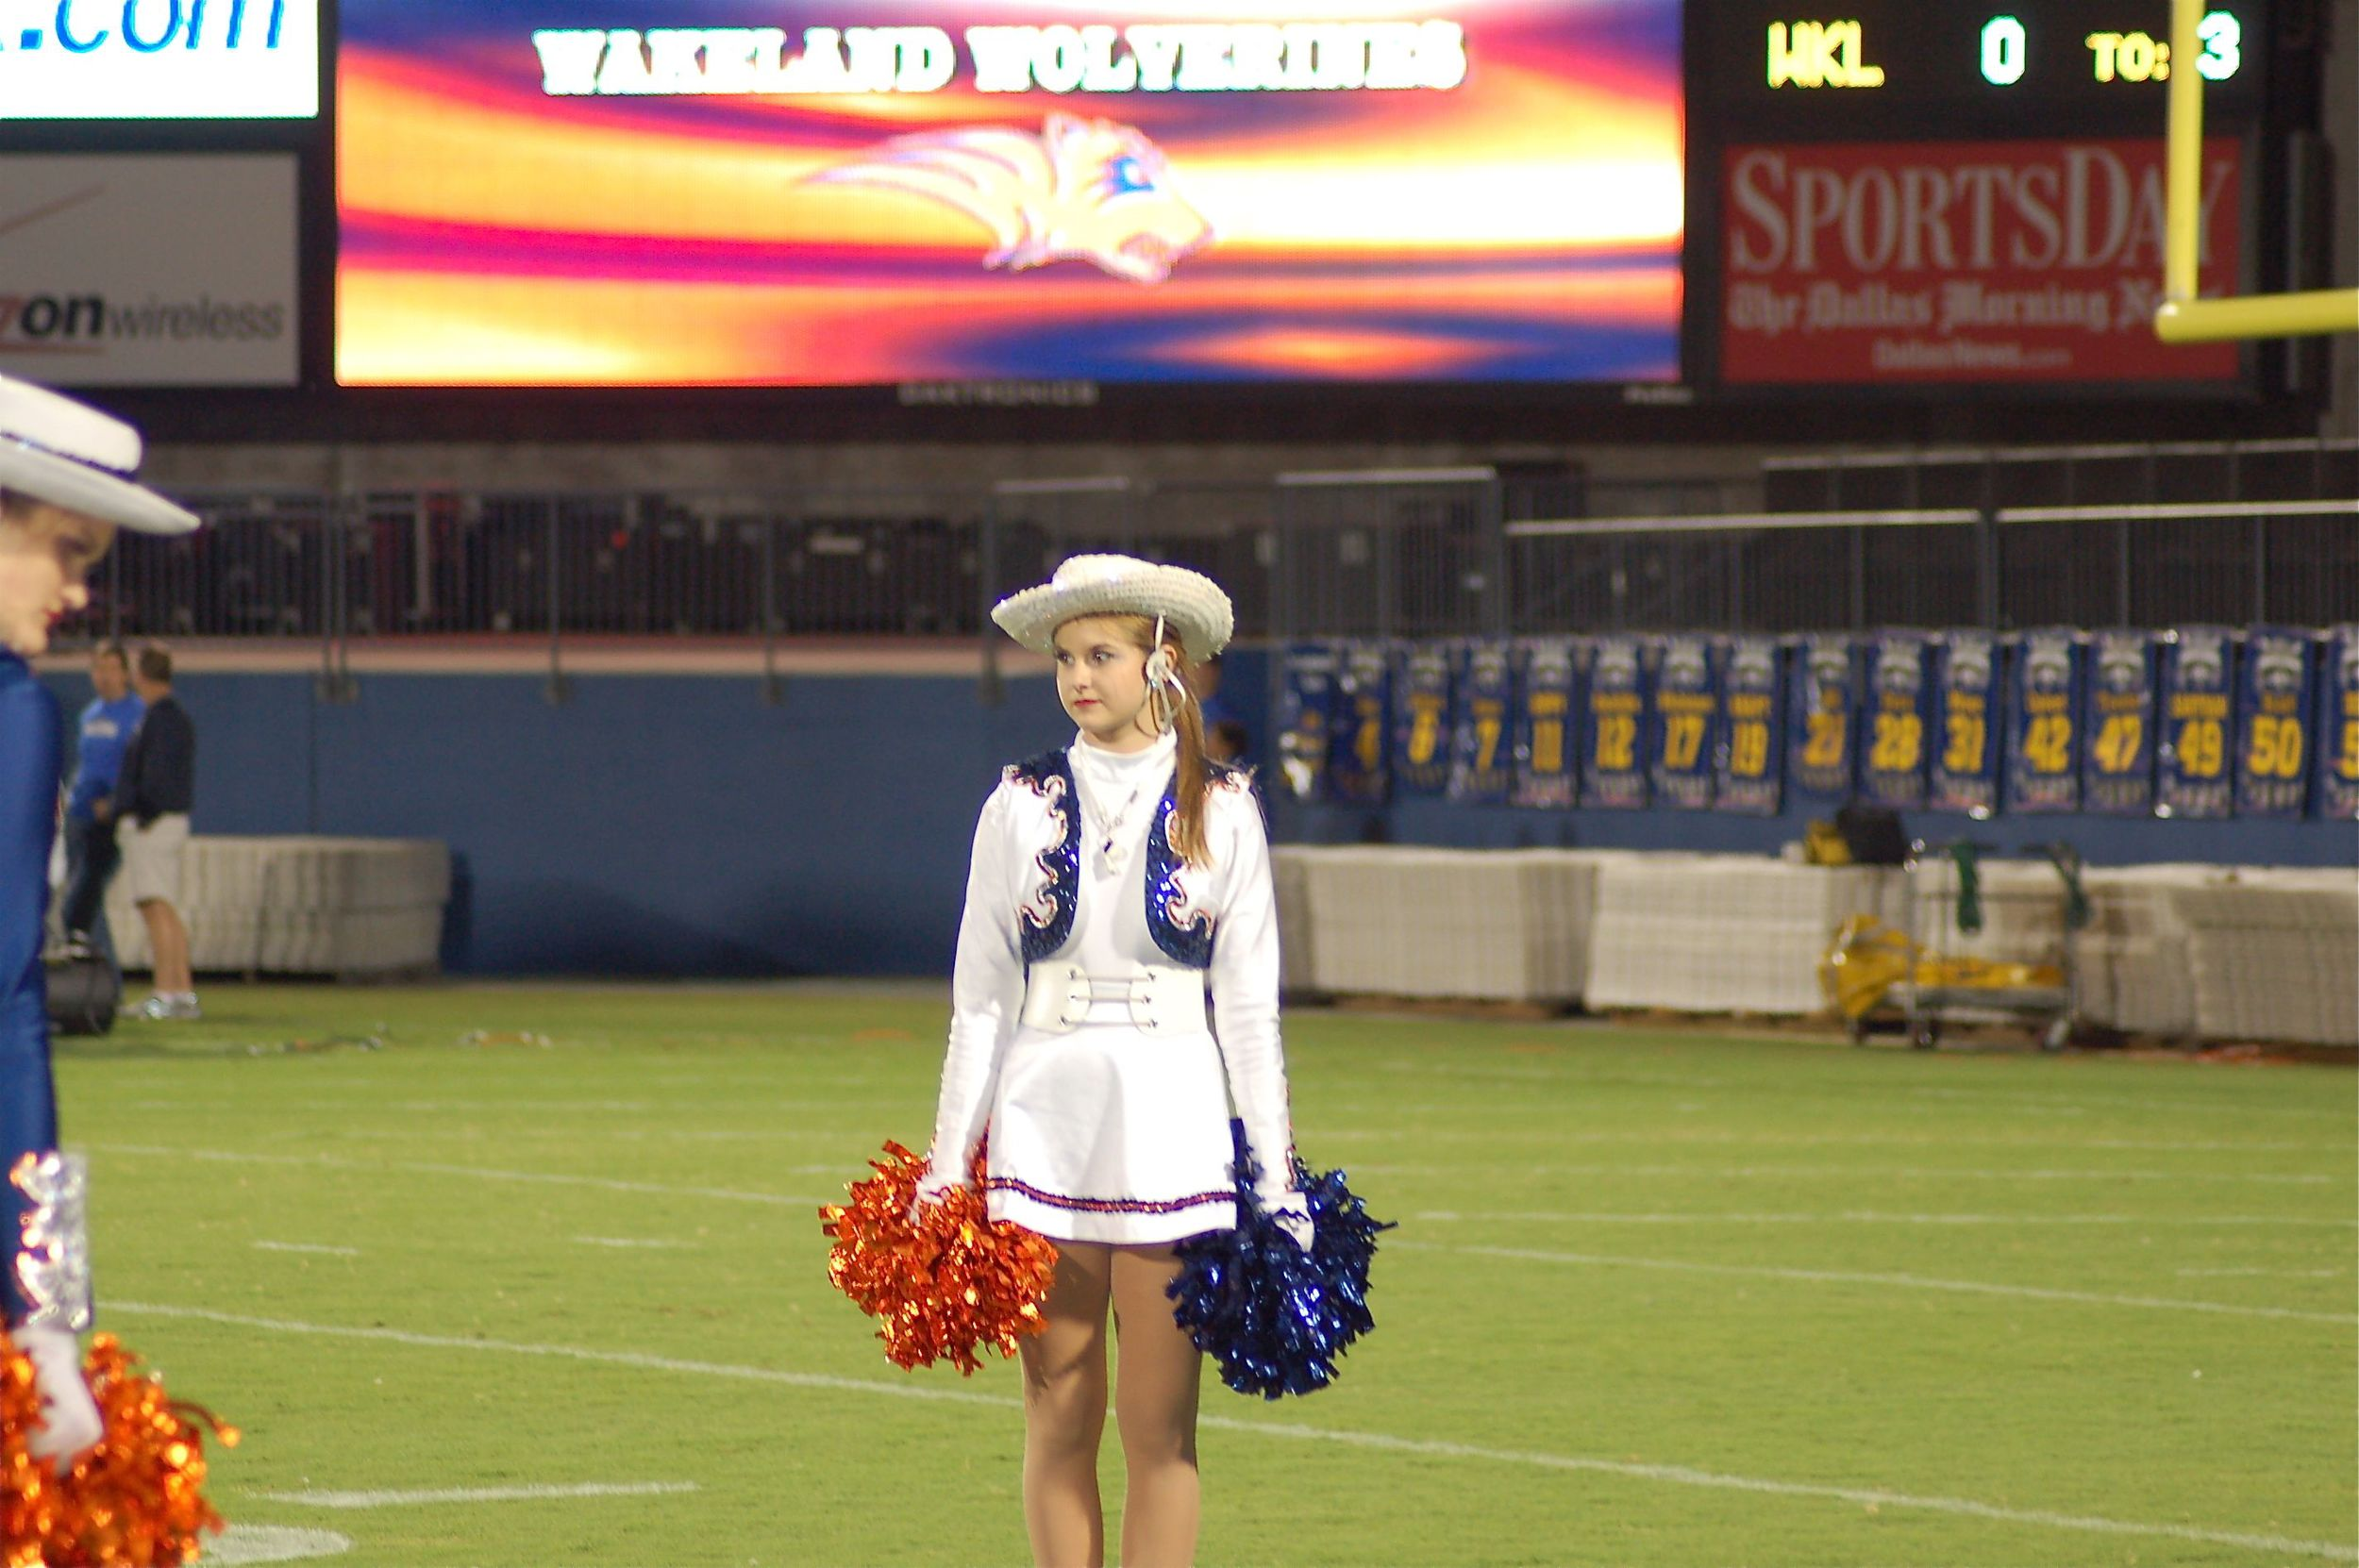 WHSLL Frisco Game 10-24-2008 - 08.jpg